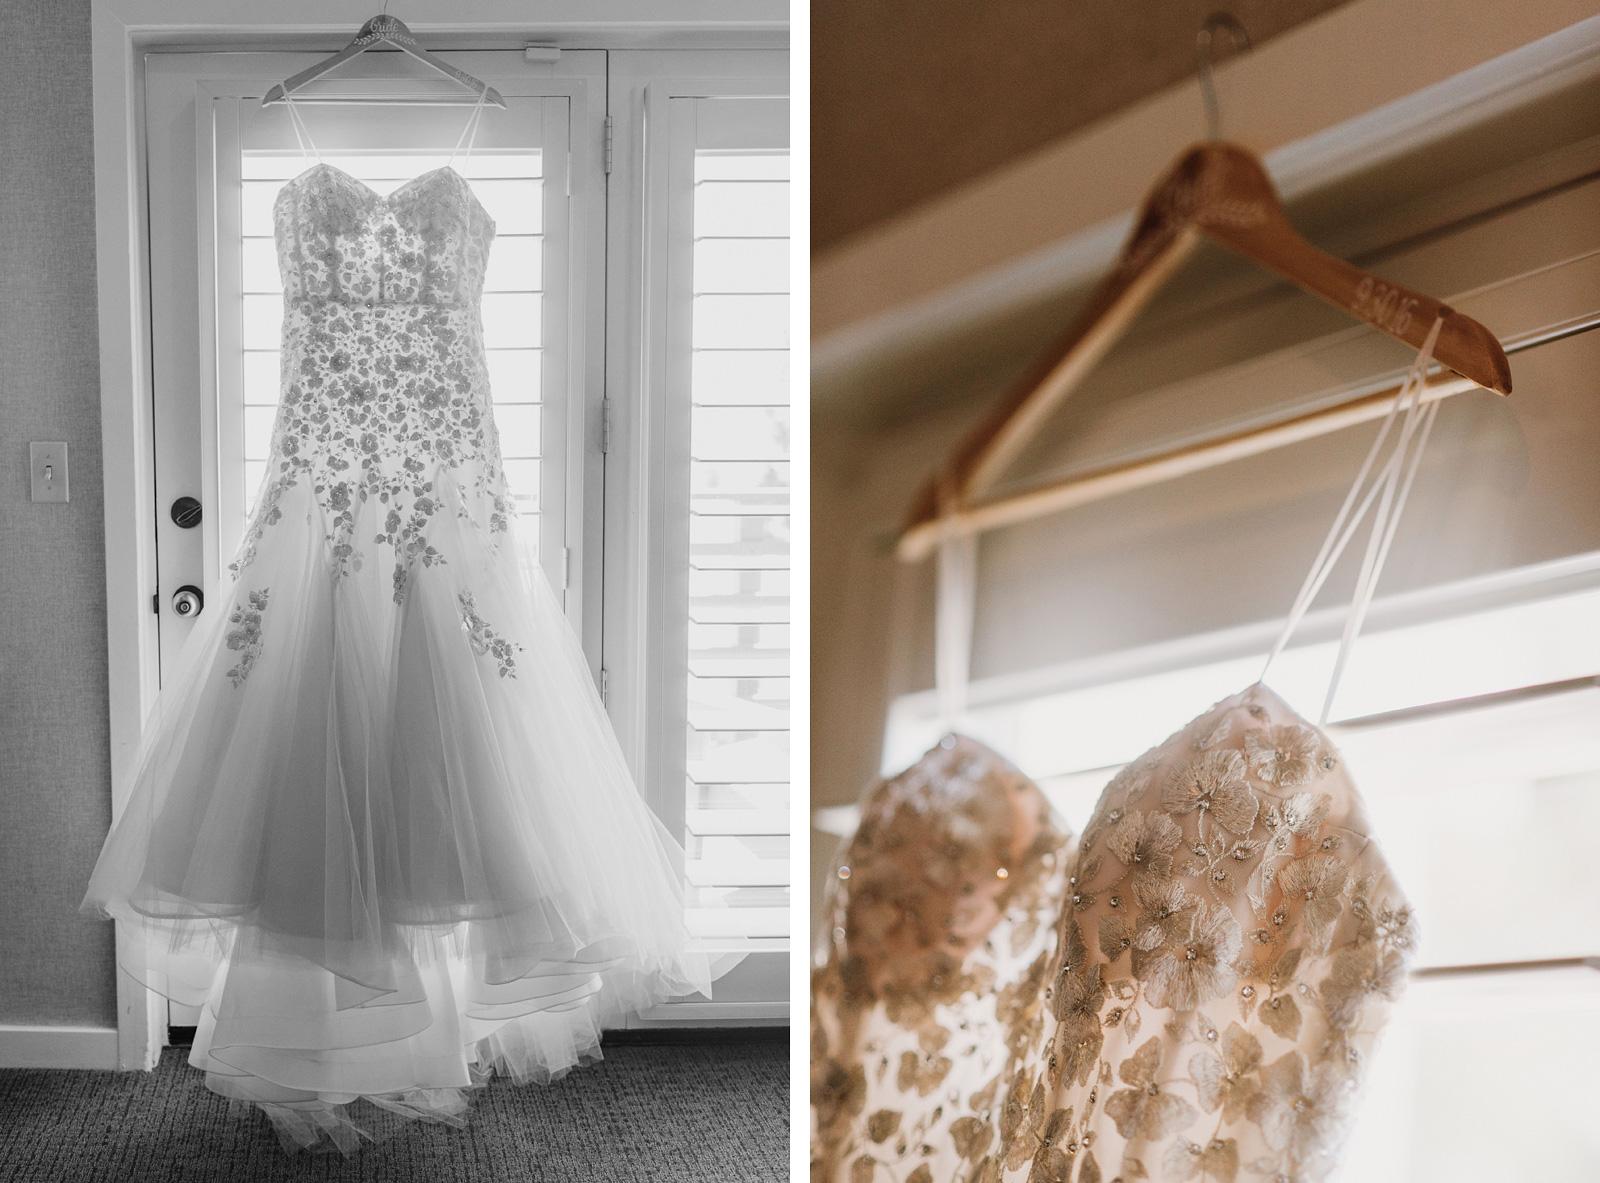 Brides dress hanging at Incline Village Wedding in North Lake Tahoe